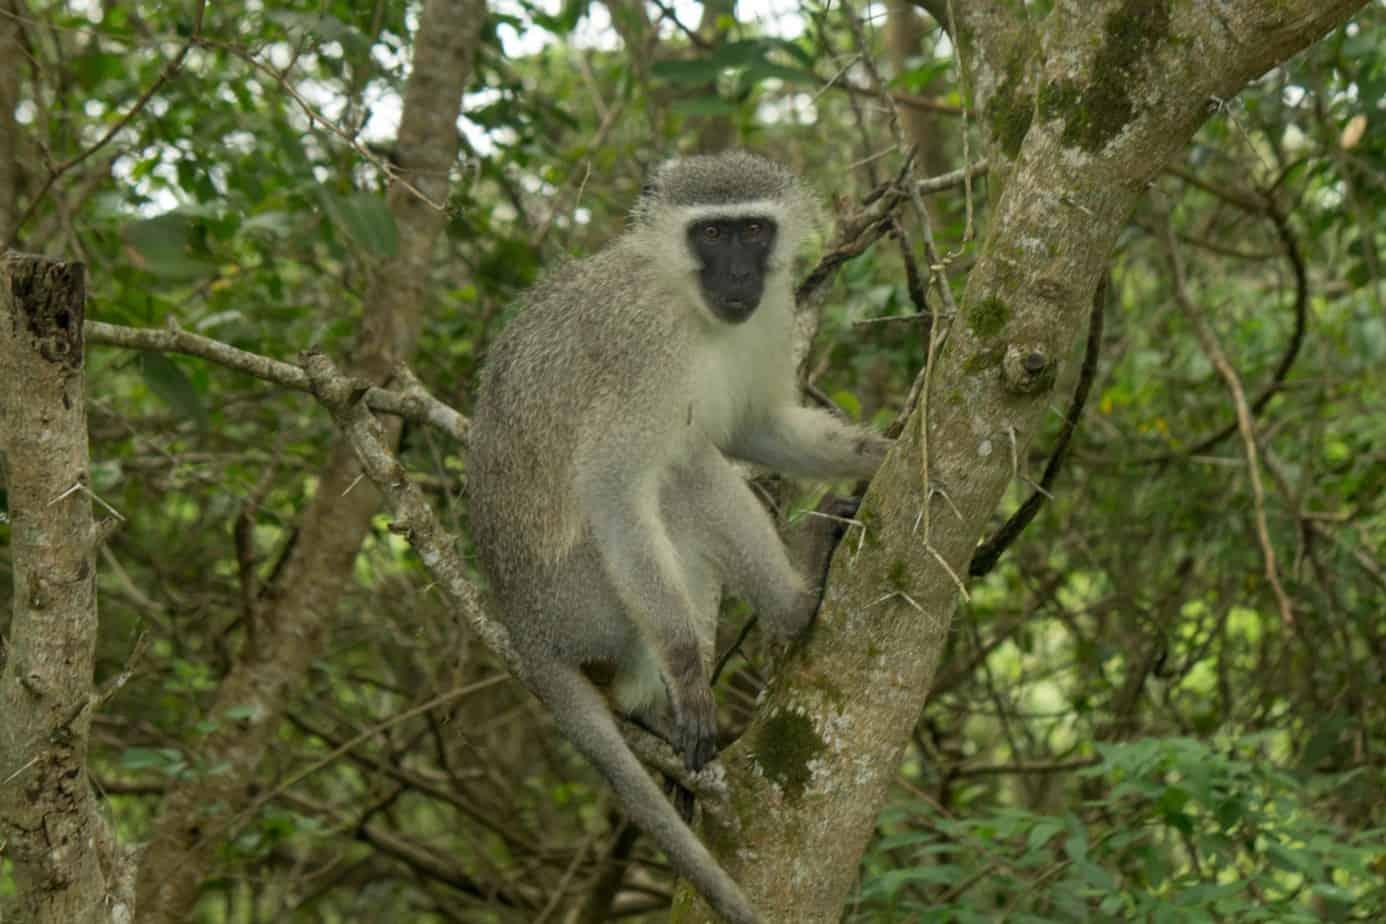 Vervet Monkey @ Eastern Shores - iSimangaliso Wetland Park. Photo: Håvard Rosenlund